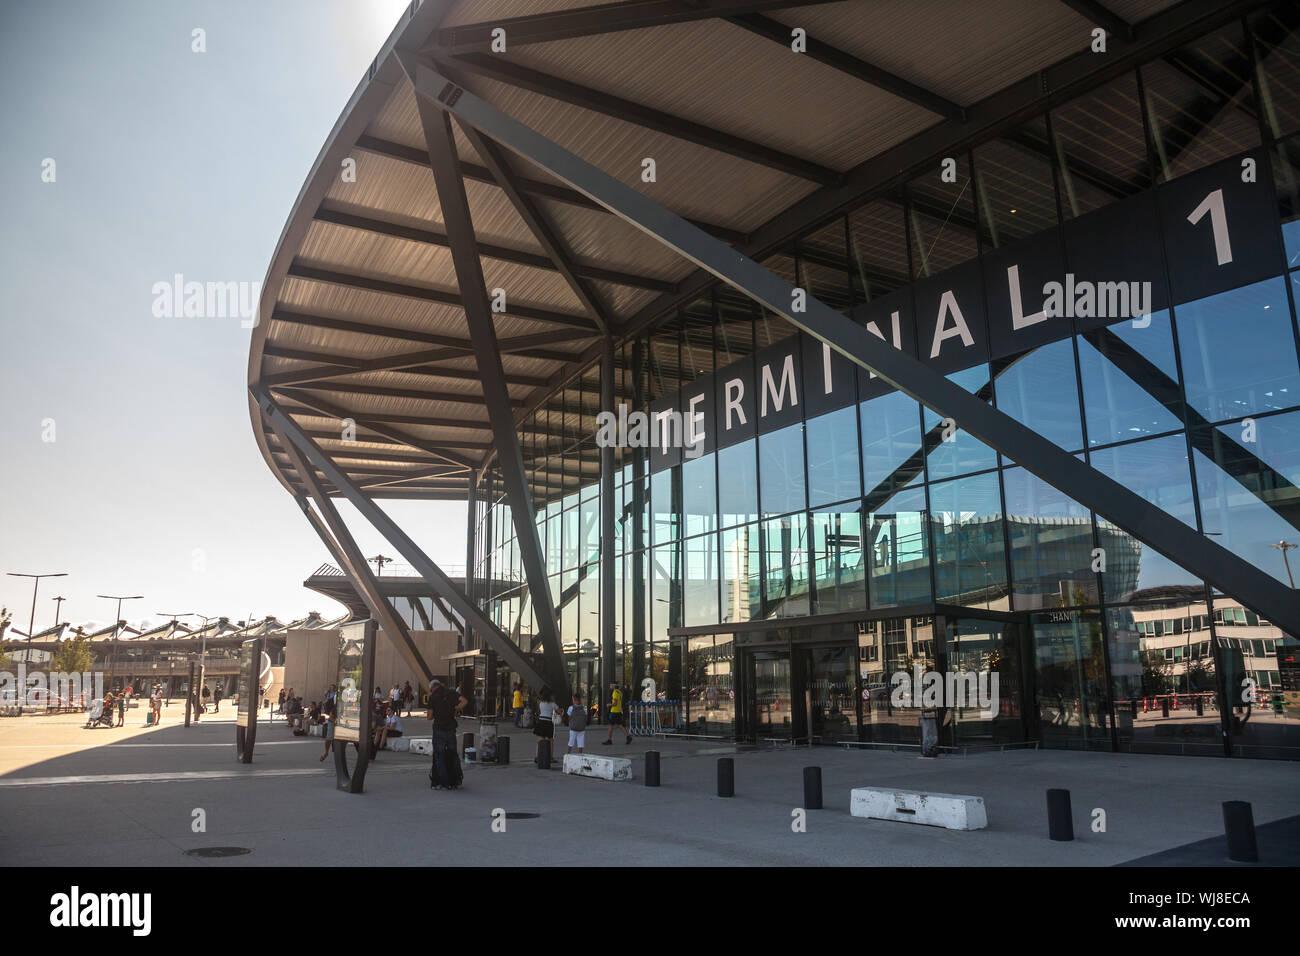 LYON, FRANCE - JULY 13, 2019: Main entrance to Terminal 1 of Aeroport de Lyon Saint Exupery Airport, formerly Satolas, the main international airport Stock Photo